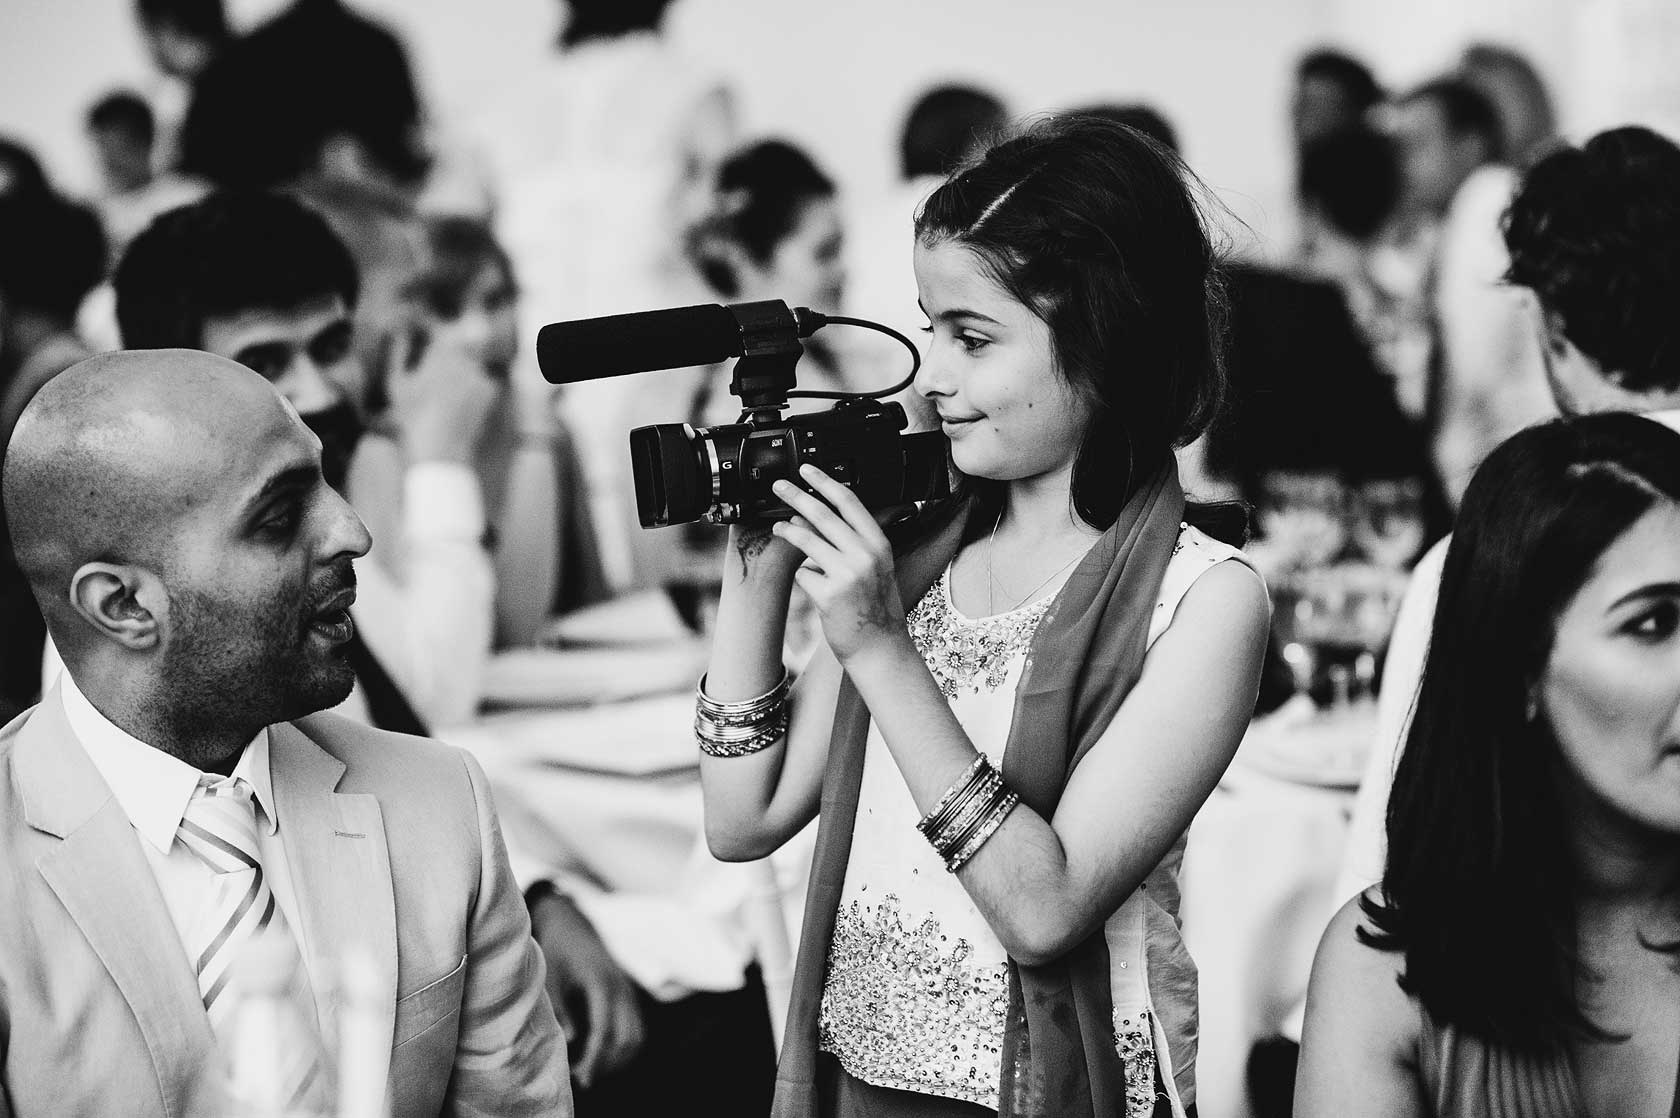 Reportage Wedding Photography at Kew Gardens